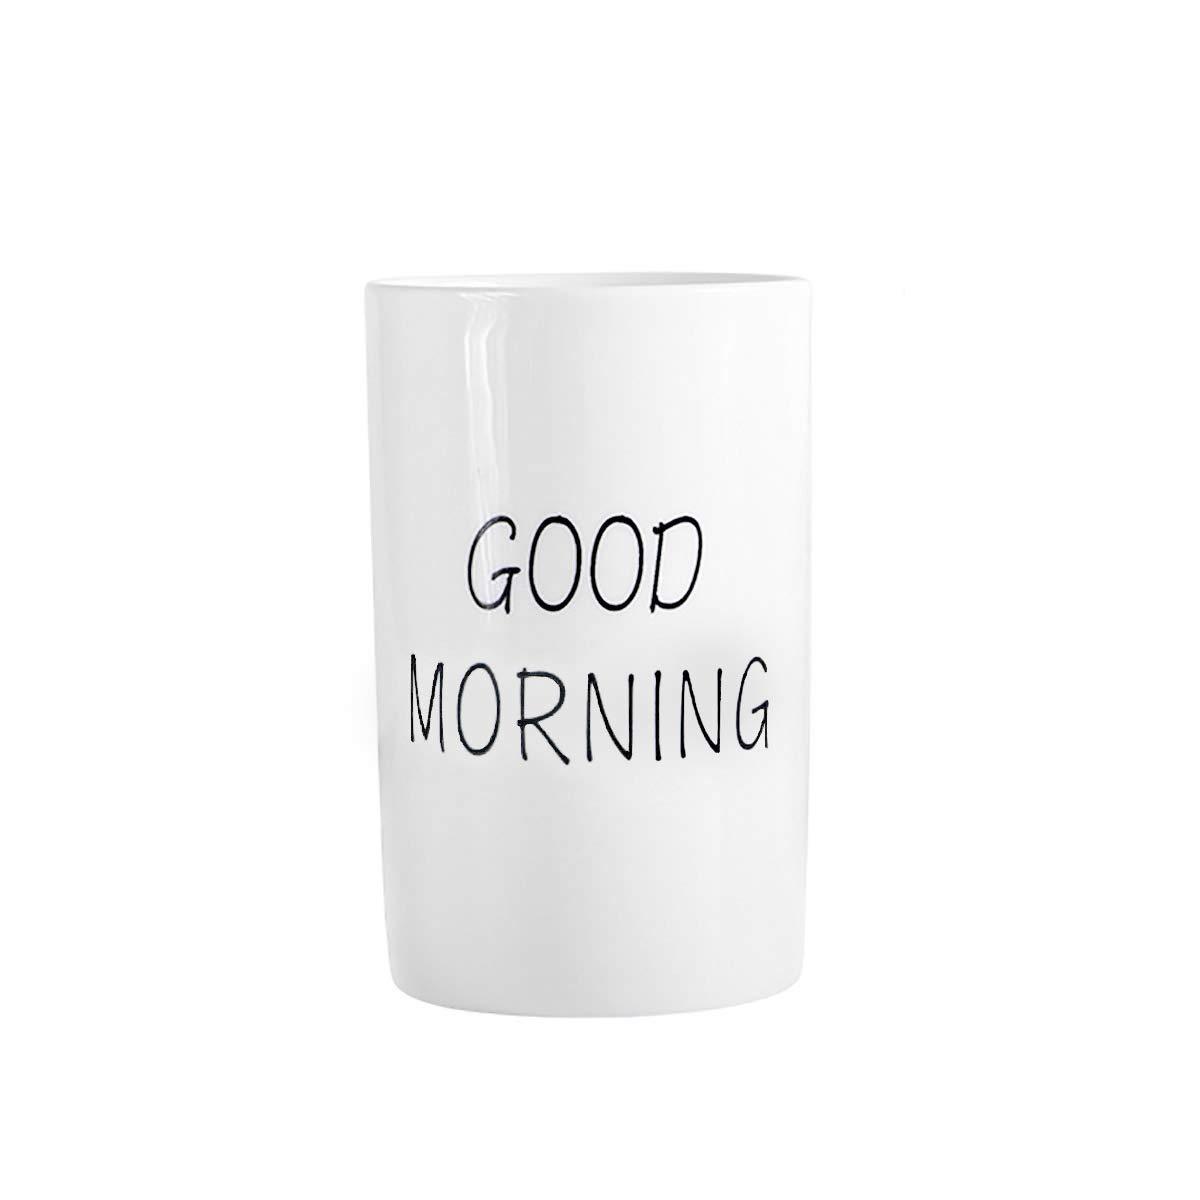 Ceramic Tumbler Cup for Bathroom Toothbrush,Water,Milk,Toothpaste (Good Morning Cup) by Kelake